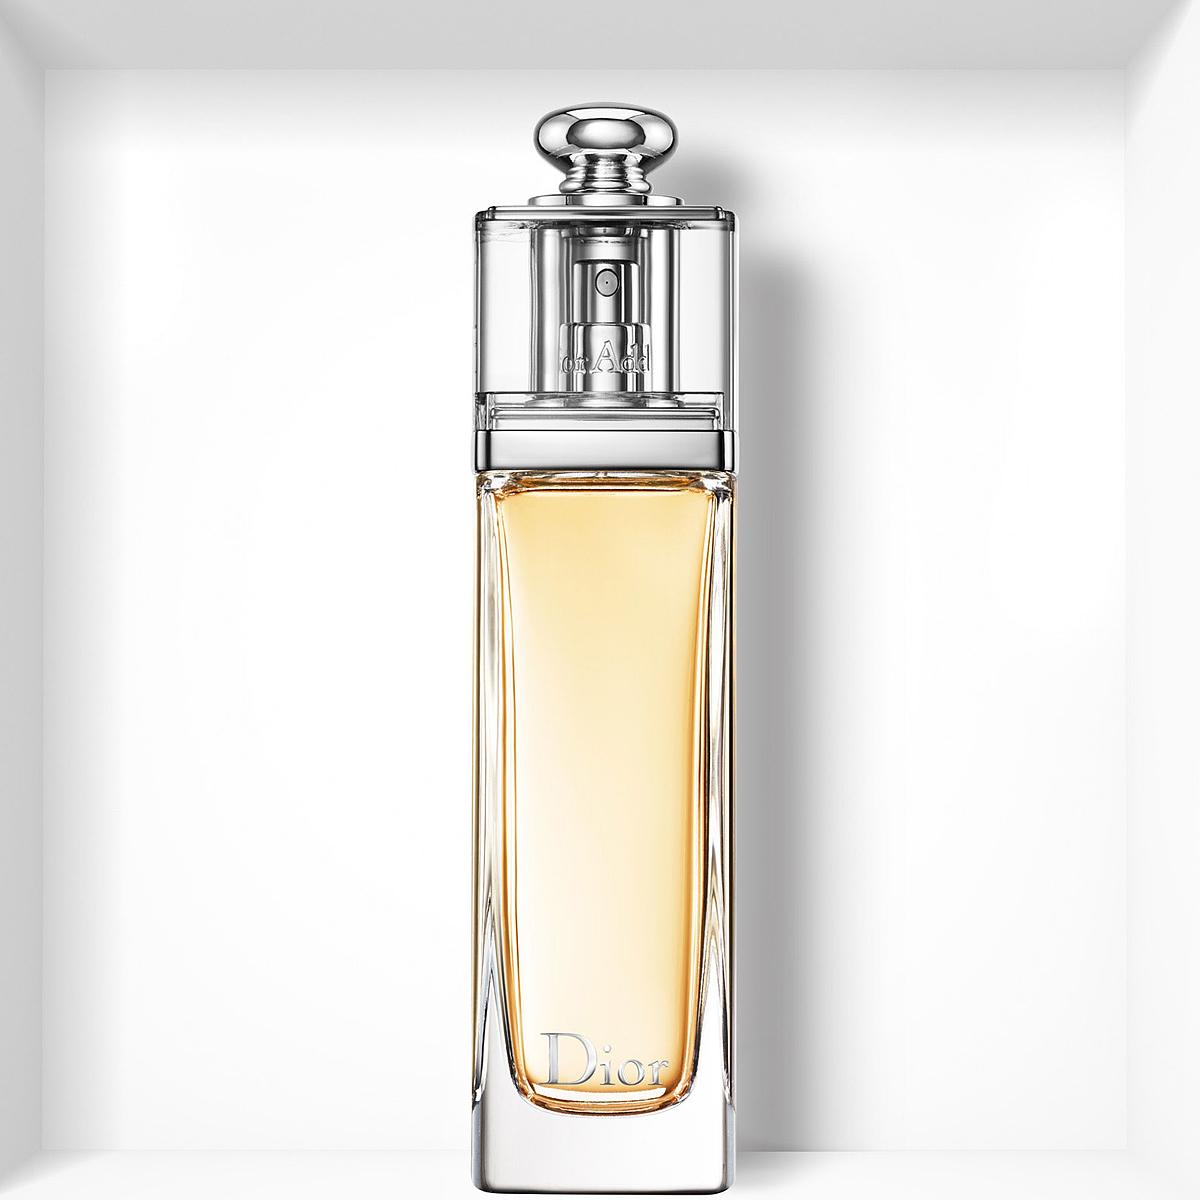 Christian Dior Dior Addict Туалетная вода женская, 50мл туалетная вода для женщин christian dior addict 50 мл